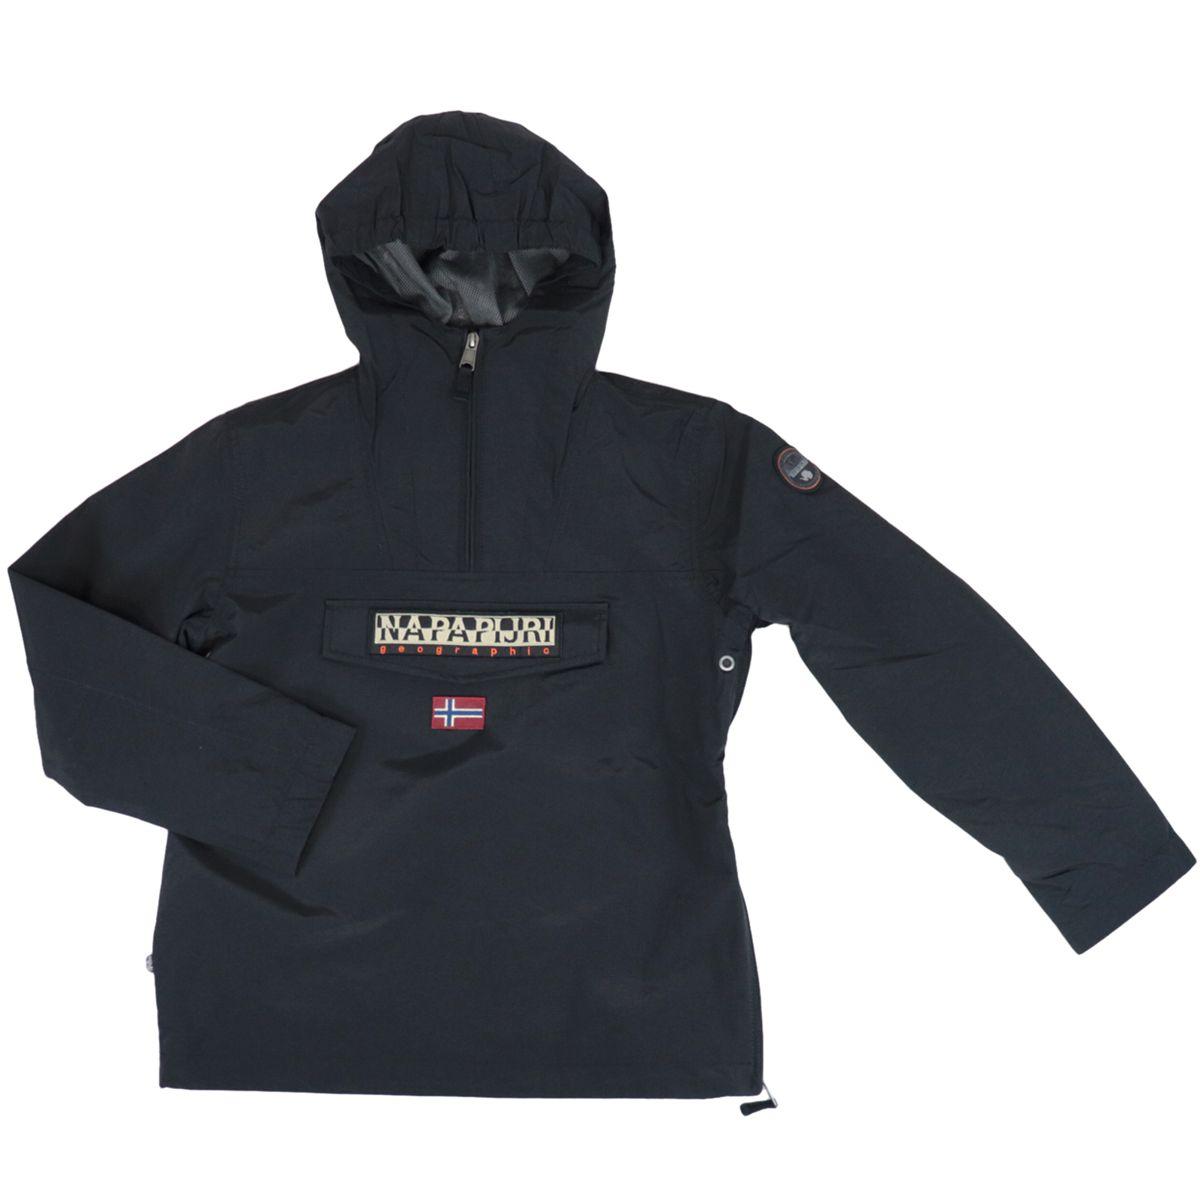 K Rainforest Sum.2 nylon jacket with hood and zip Black NAPAPIJRI